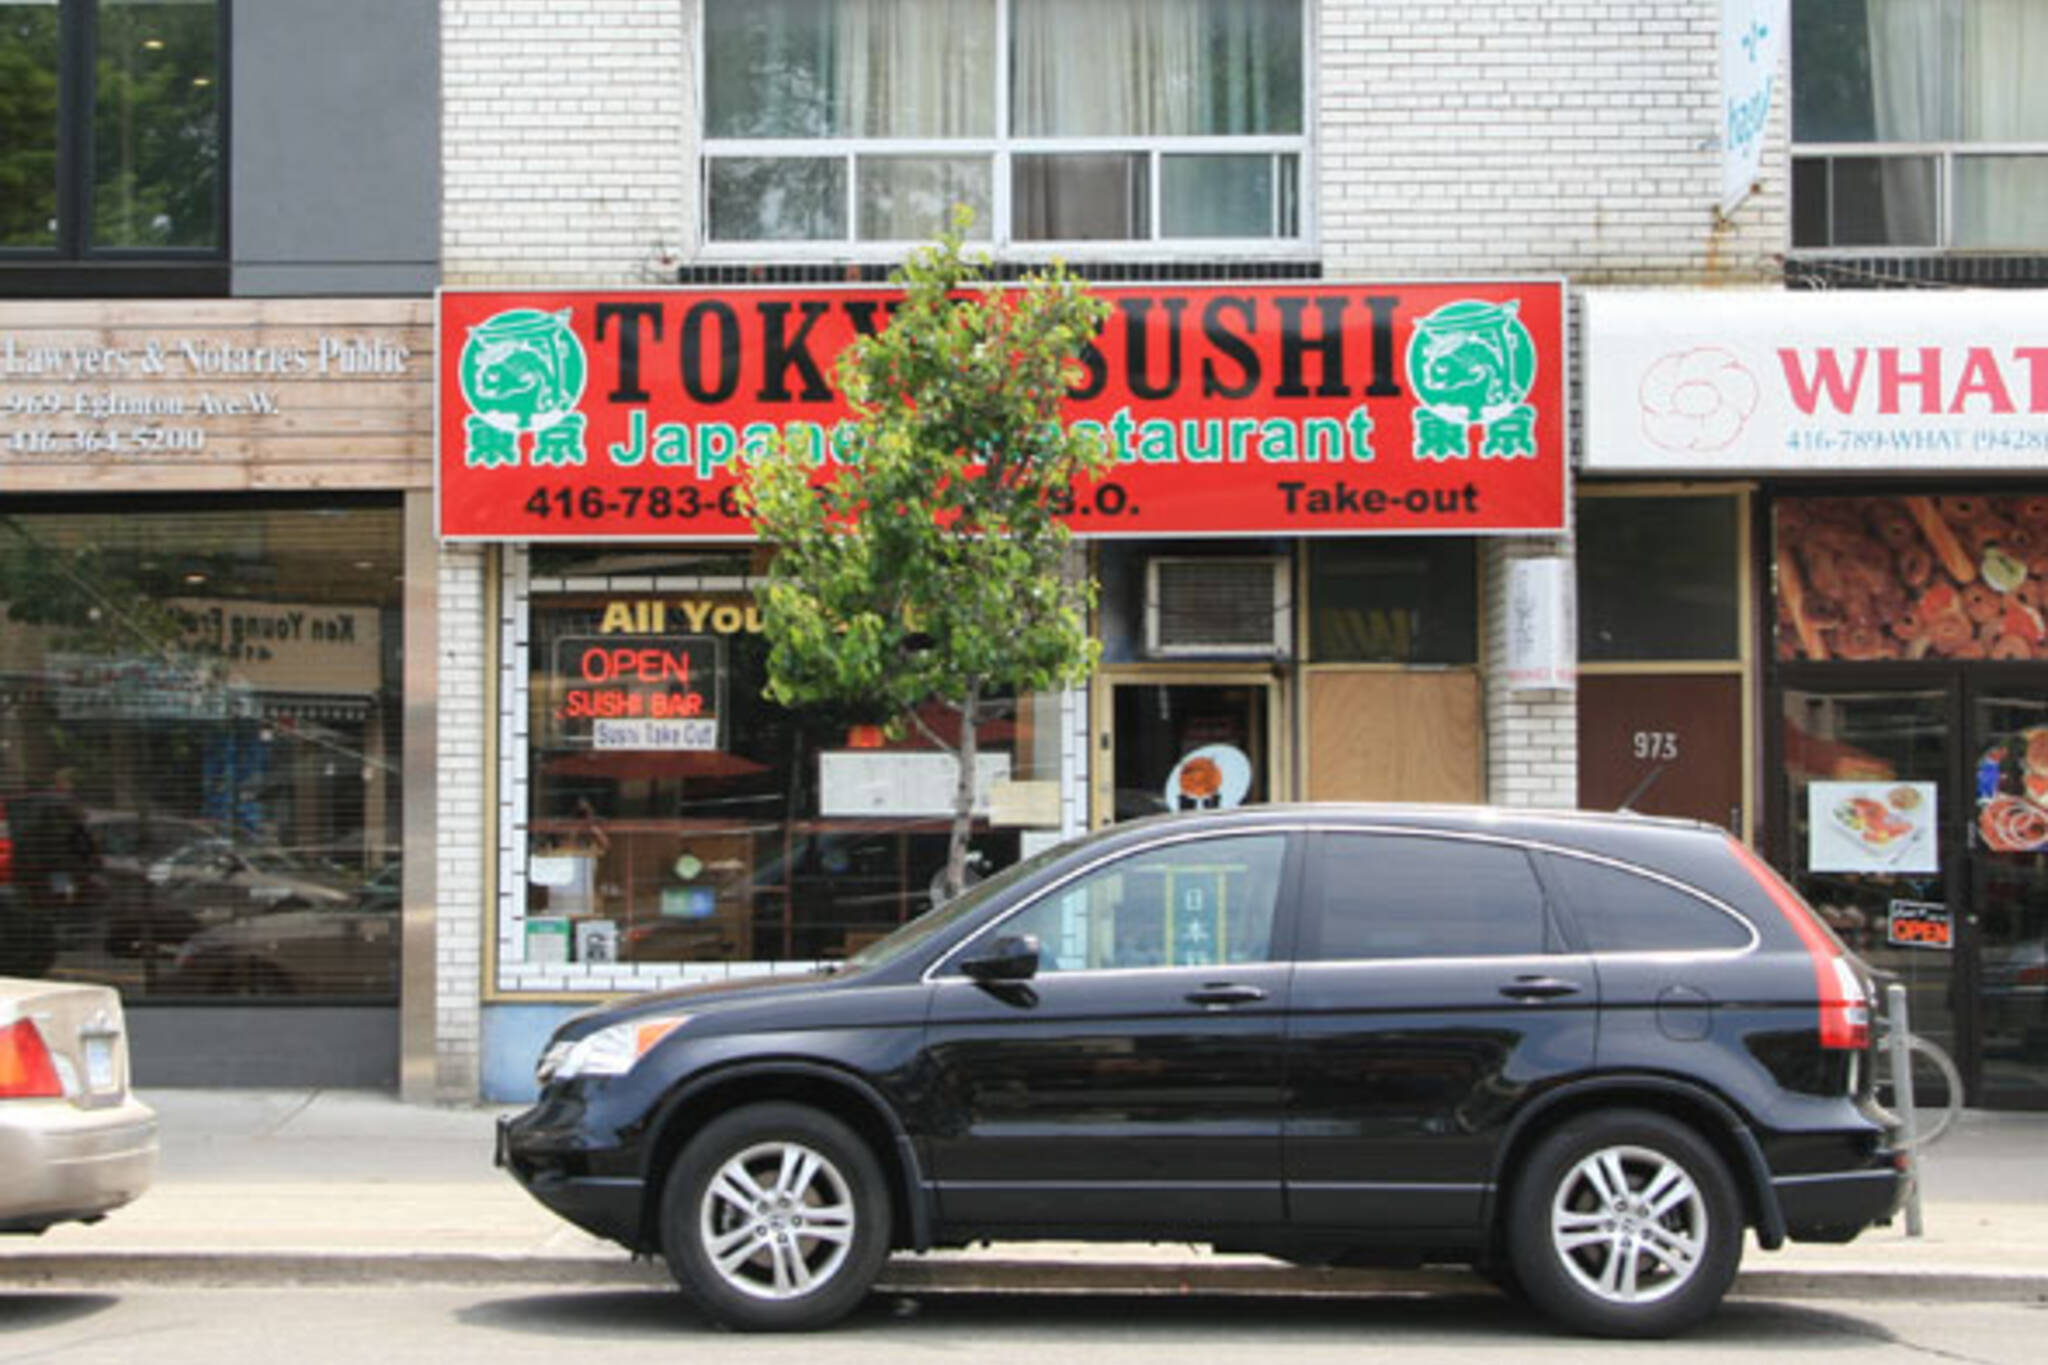 Tokyo Sushi (Eglinton W)